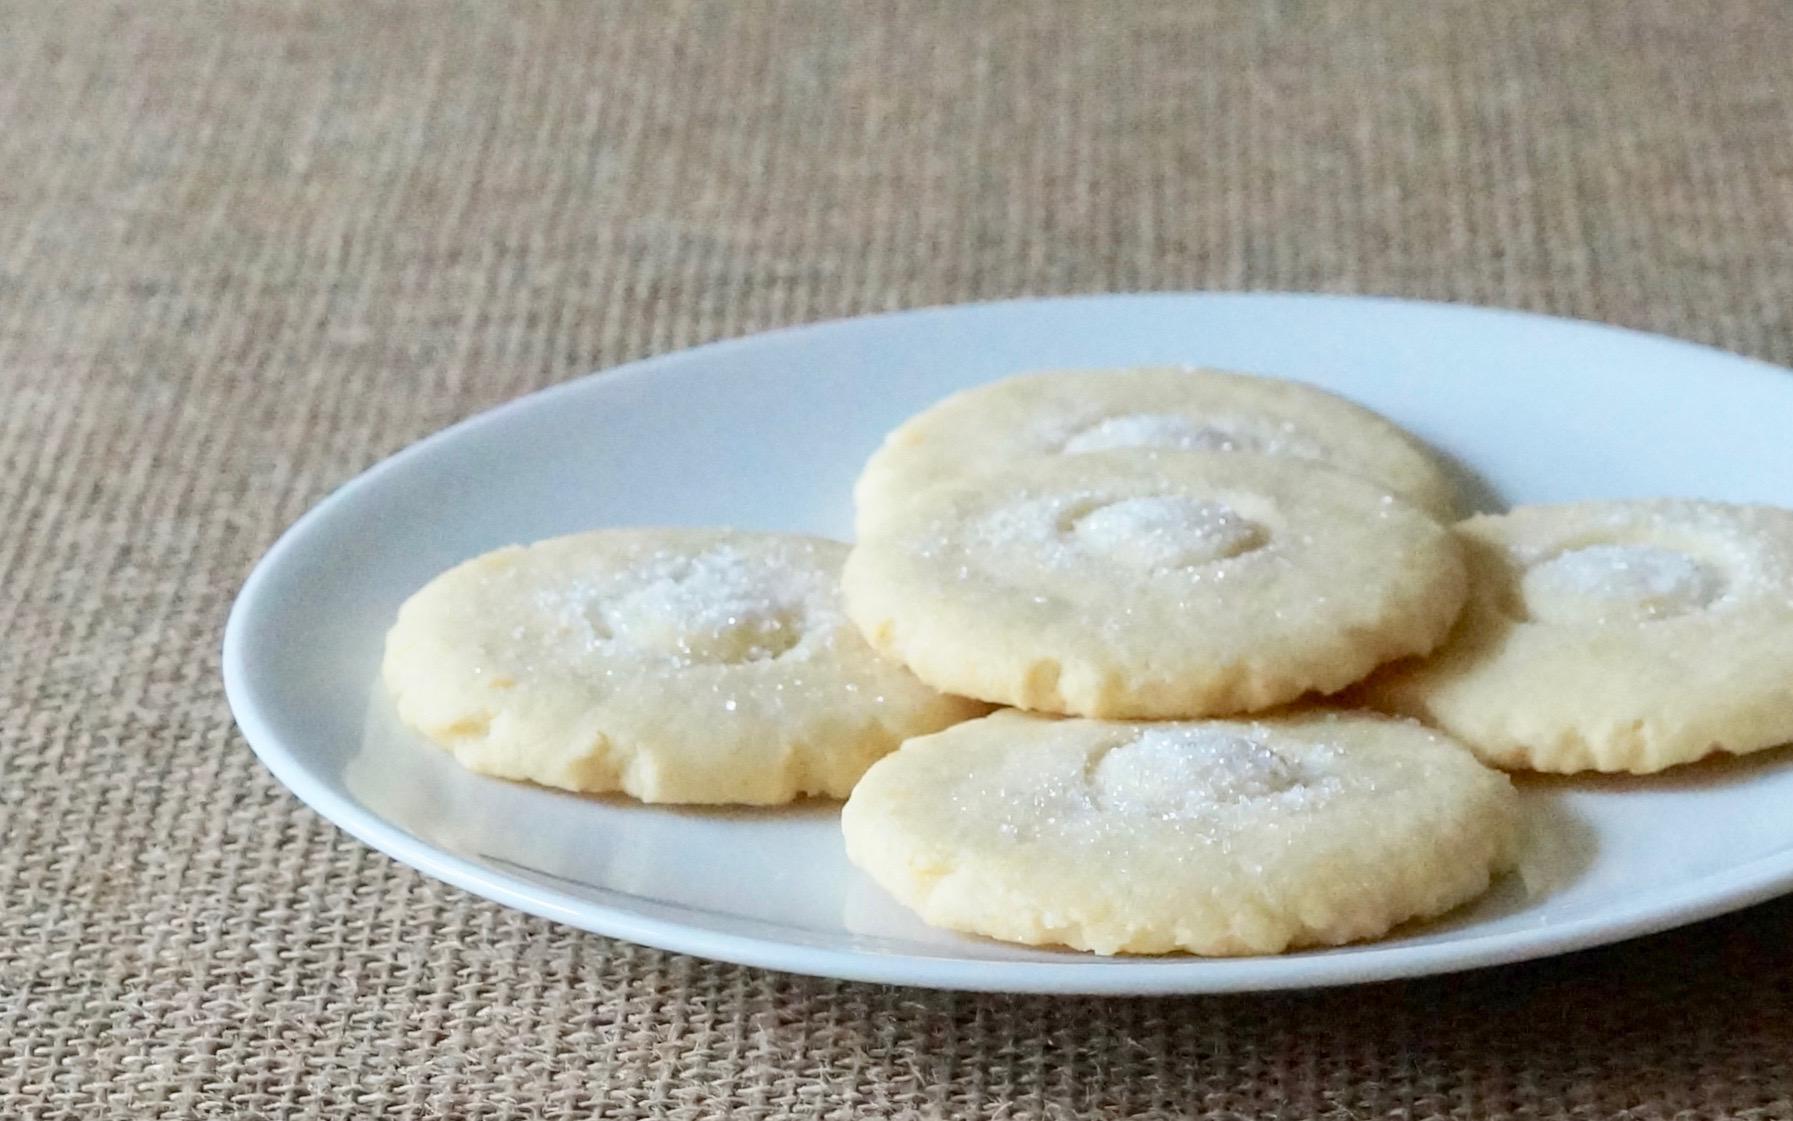 Vegetable-Shortening-Polvorones Con Aroma A Naranja-Rebecca-Gordon-Editor-In-Chief-Buttermilk-Lipstick-Culinary-Entertaining-Techniques-Baking-Classic-Mexican-Sugar-Cookies-RebeccaGordon-Pastry-Chef-Birmingham-Alabama